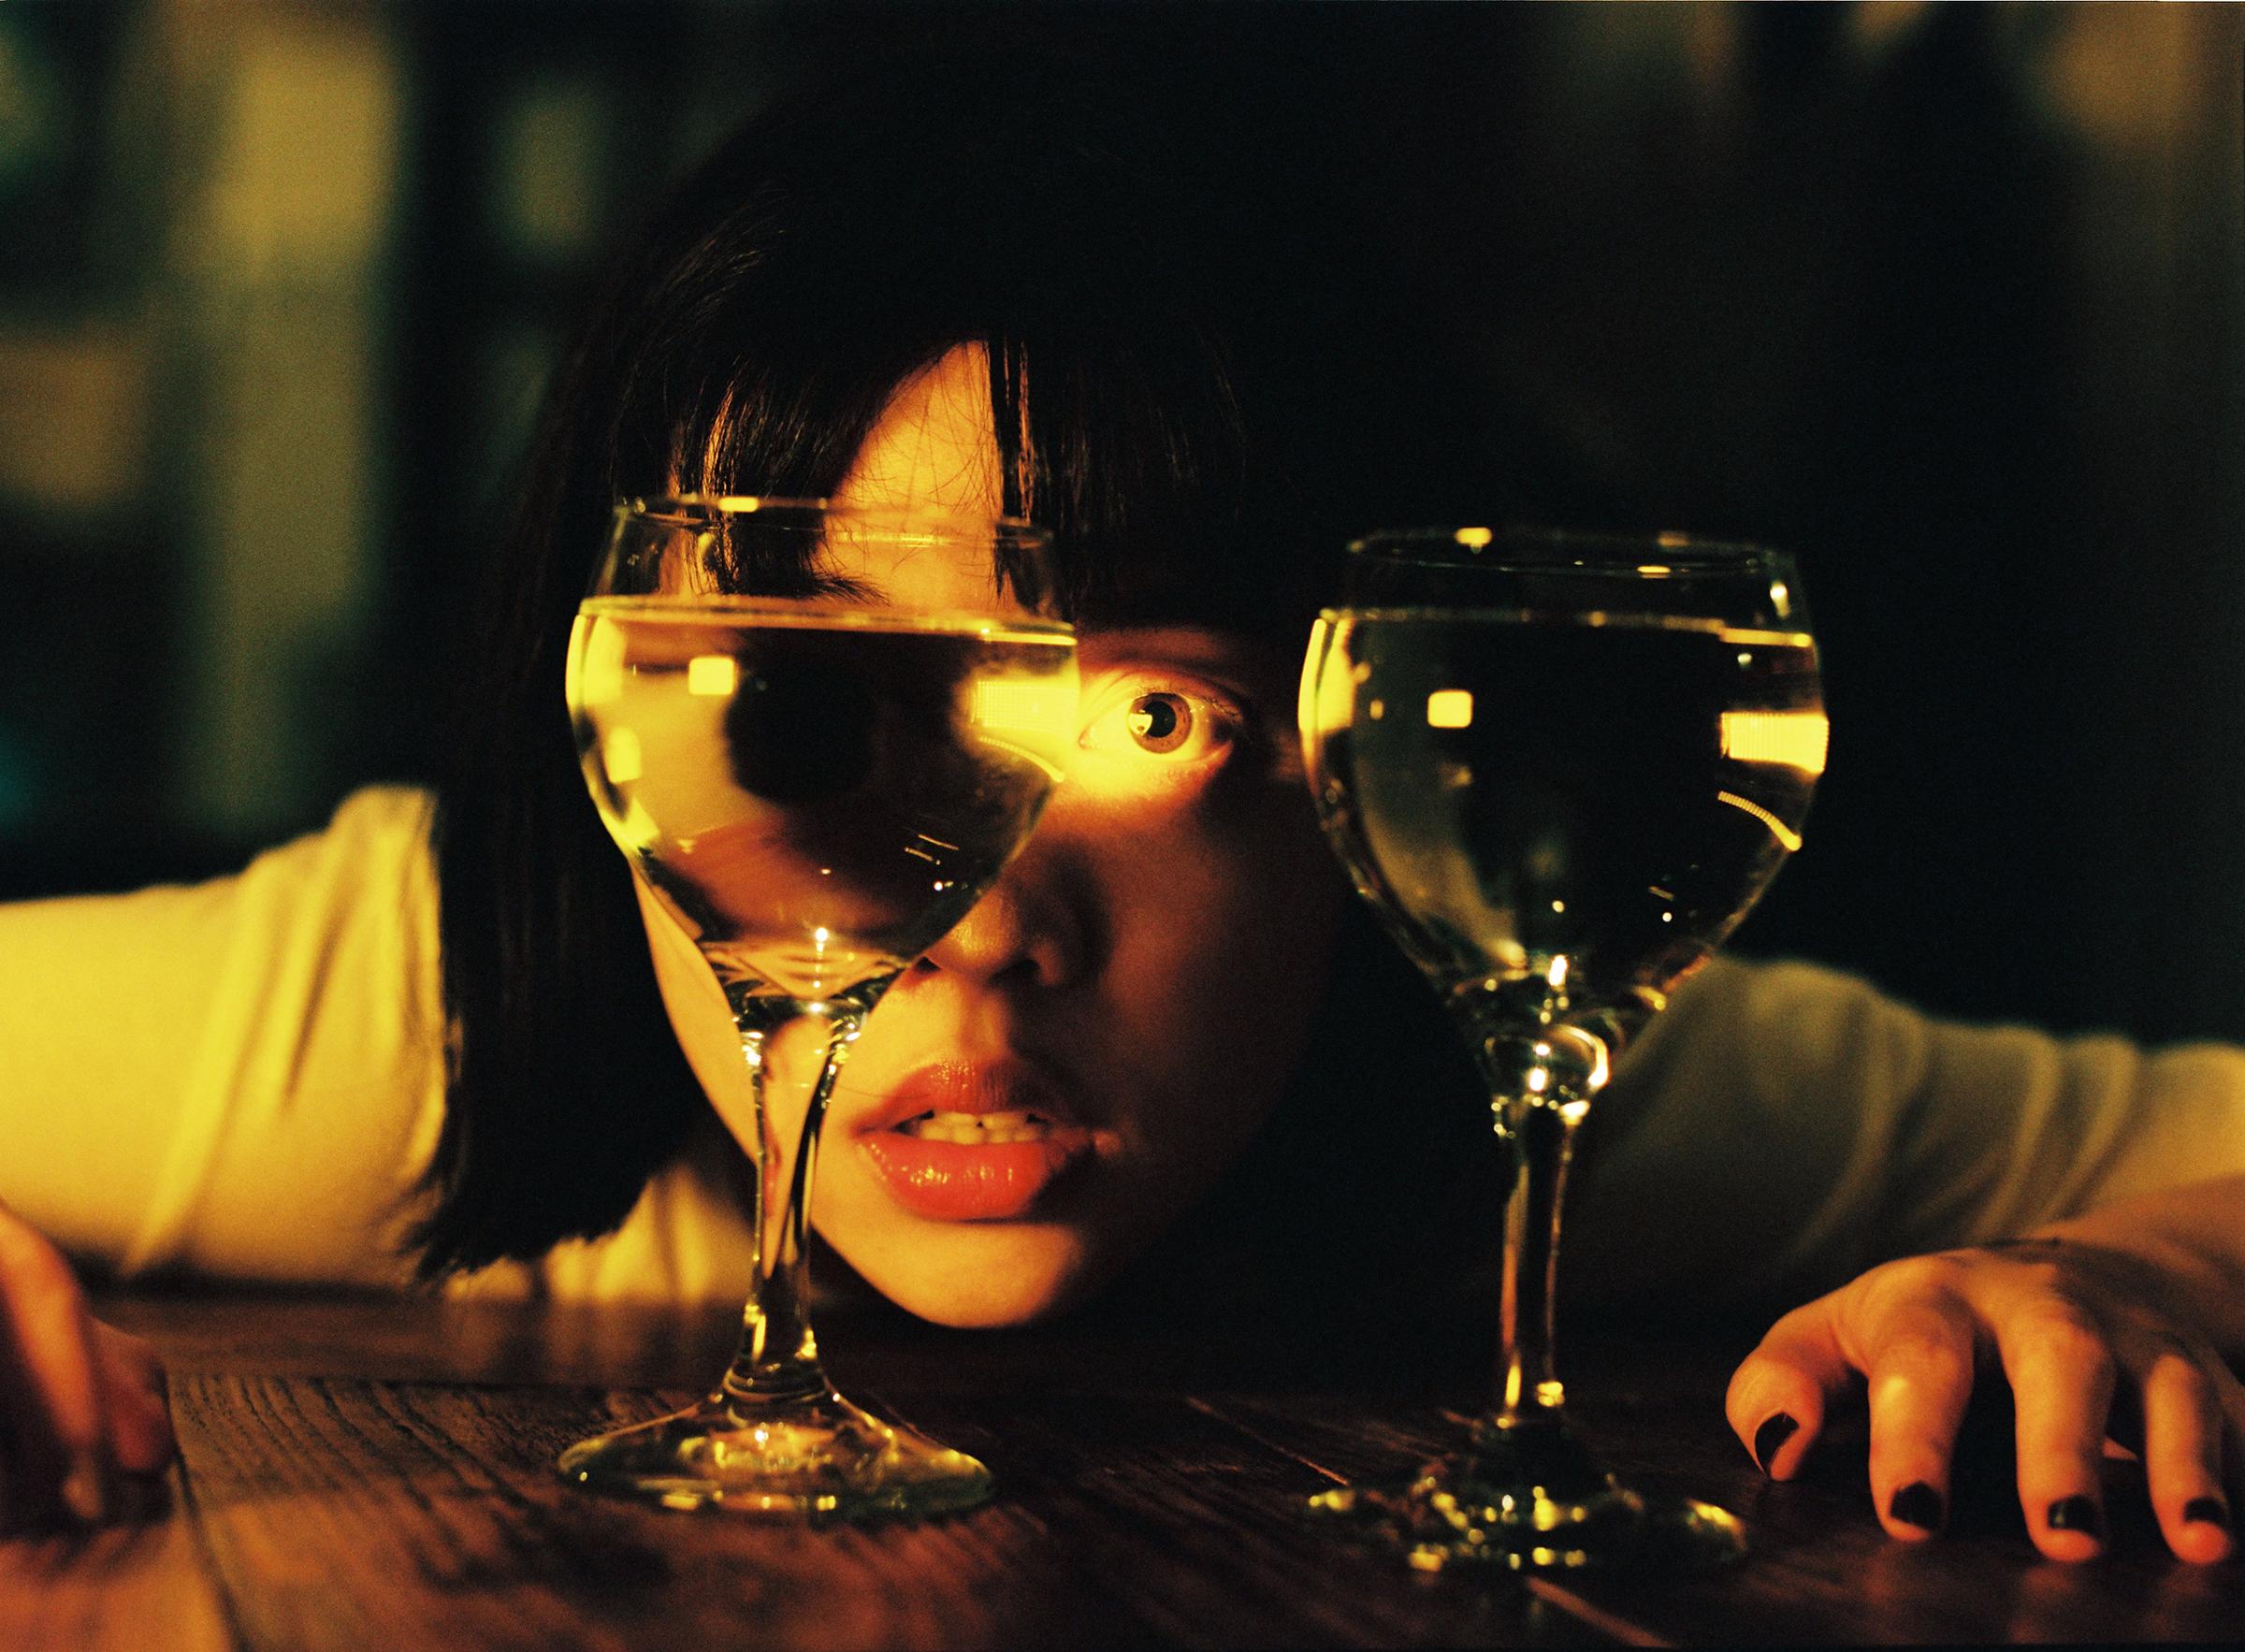 puzzleman_leung_35mmm_tealmagazine